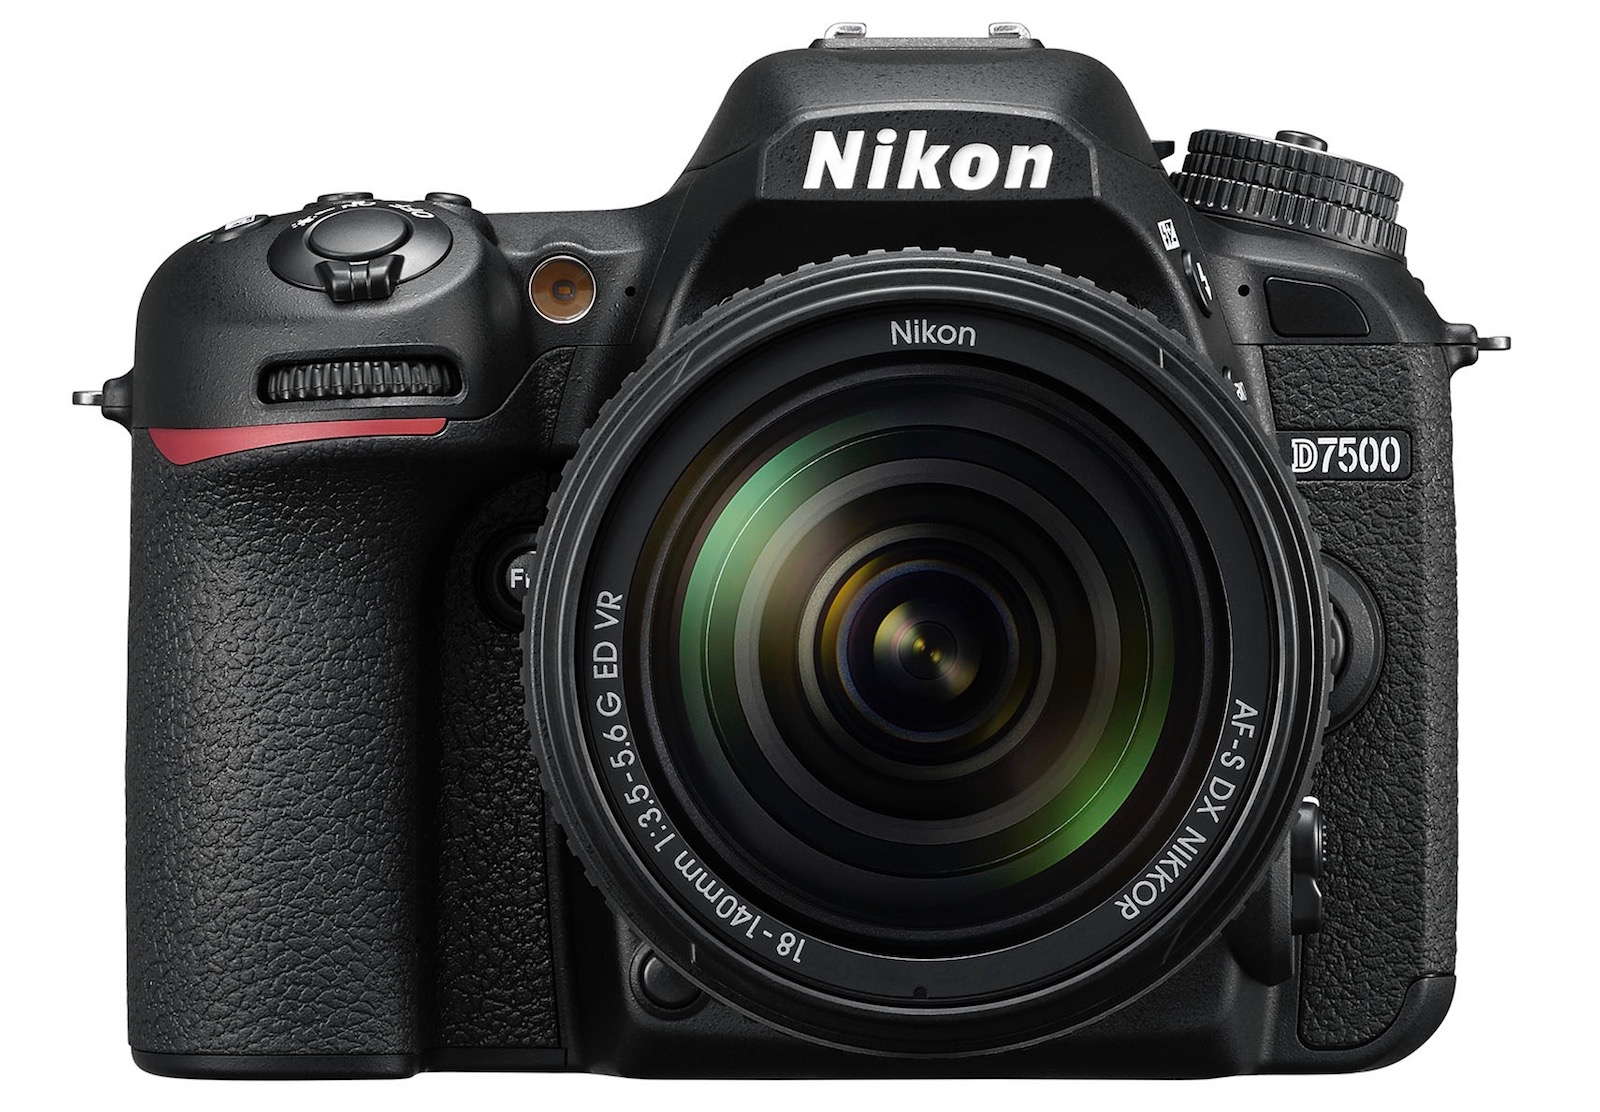 e72533b3e960 Google News - Nikon AF-S DX Nikkor 35mm f 1.8G - Latest